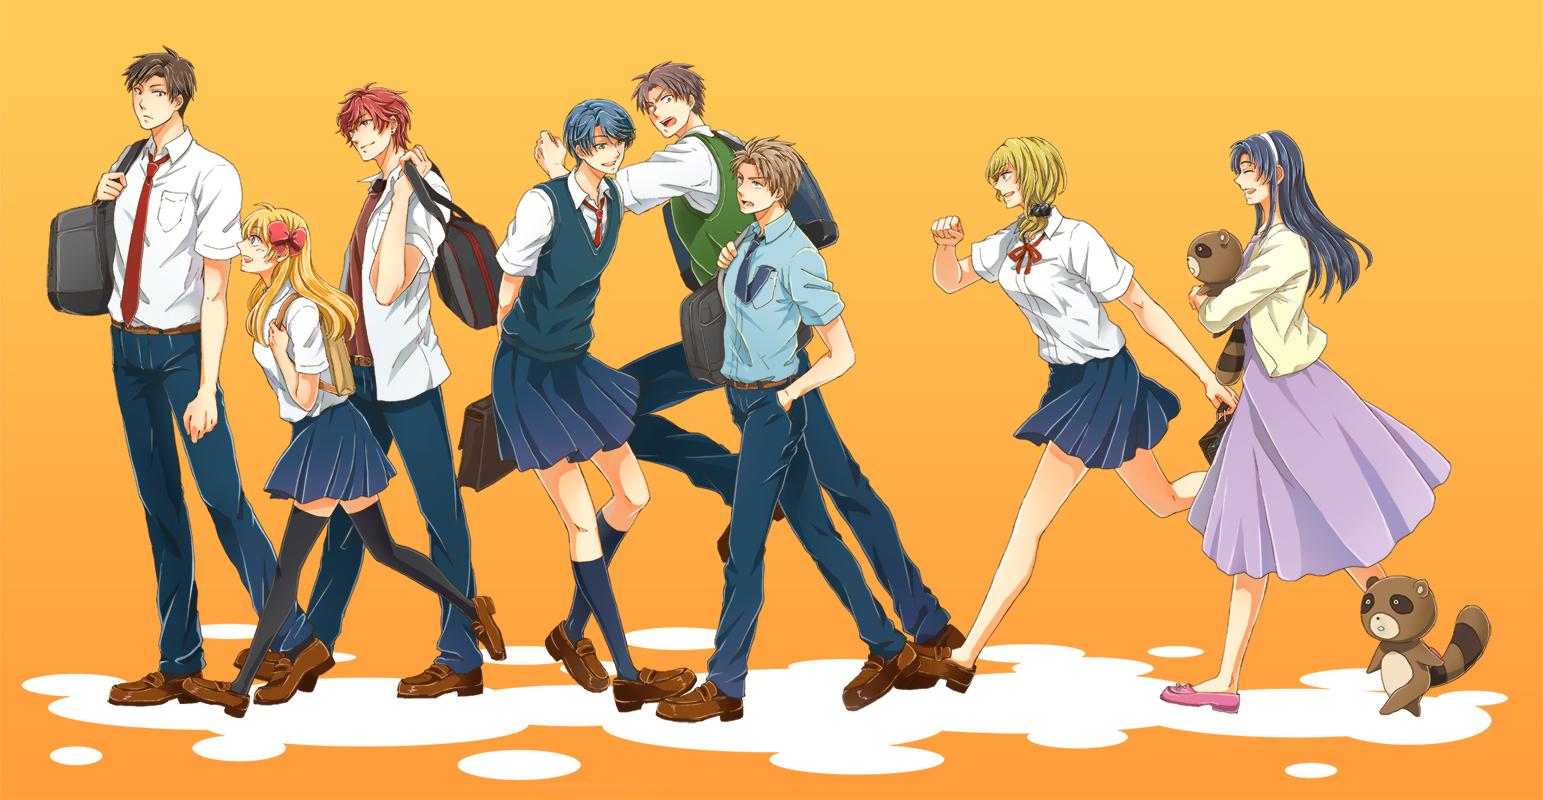 Miyako Yukari Gekkan Shoujo Nozaki Kun Zerochan Anime Image Board